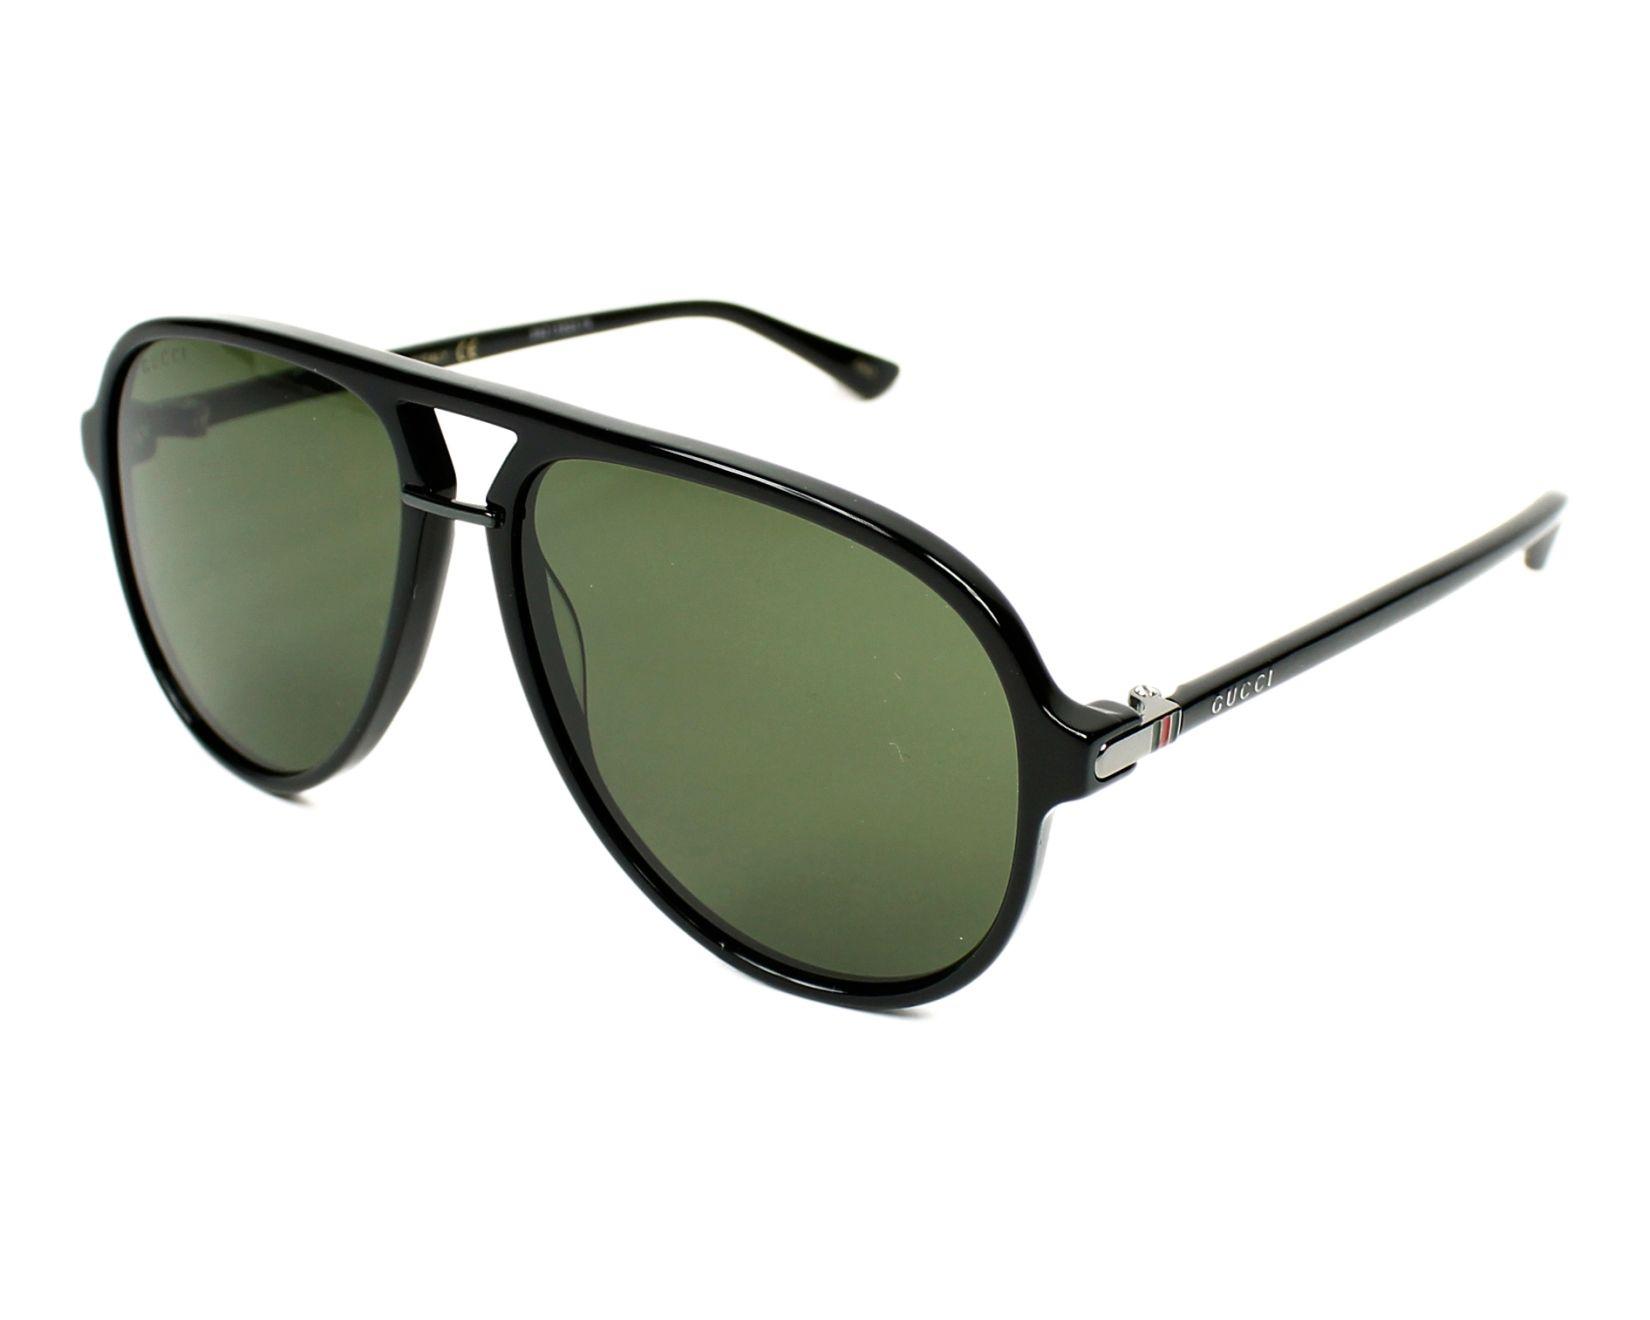 Gucci Sonnenbrille (GG0015S 004 58) q0PkL35GT